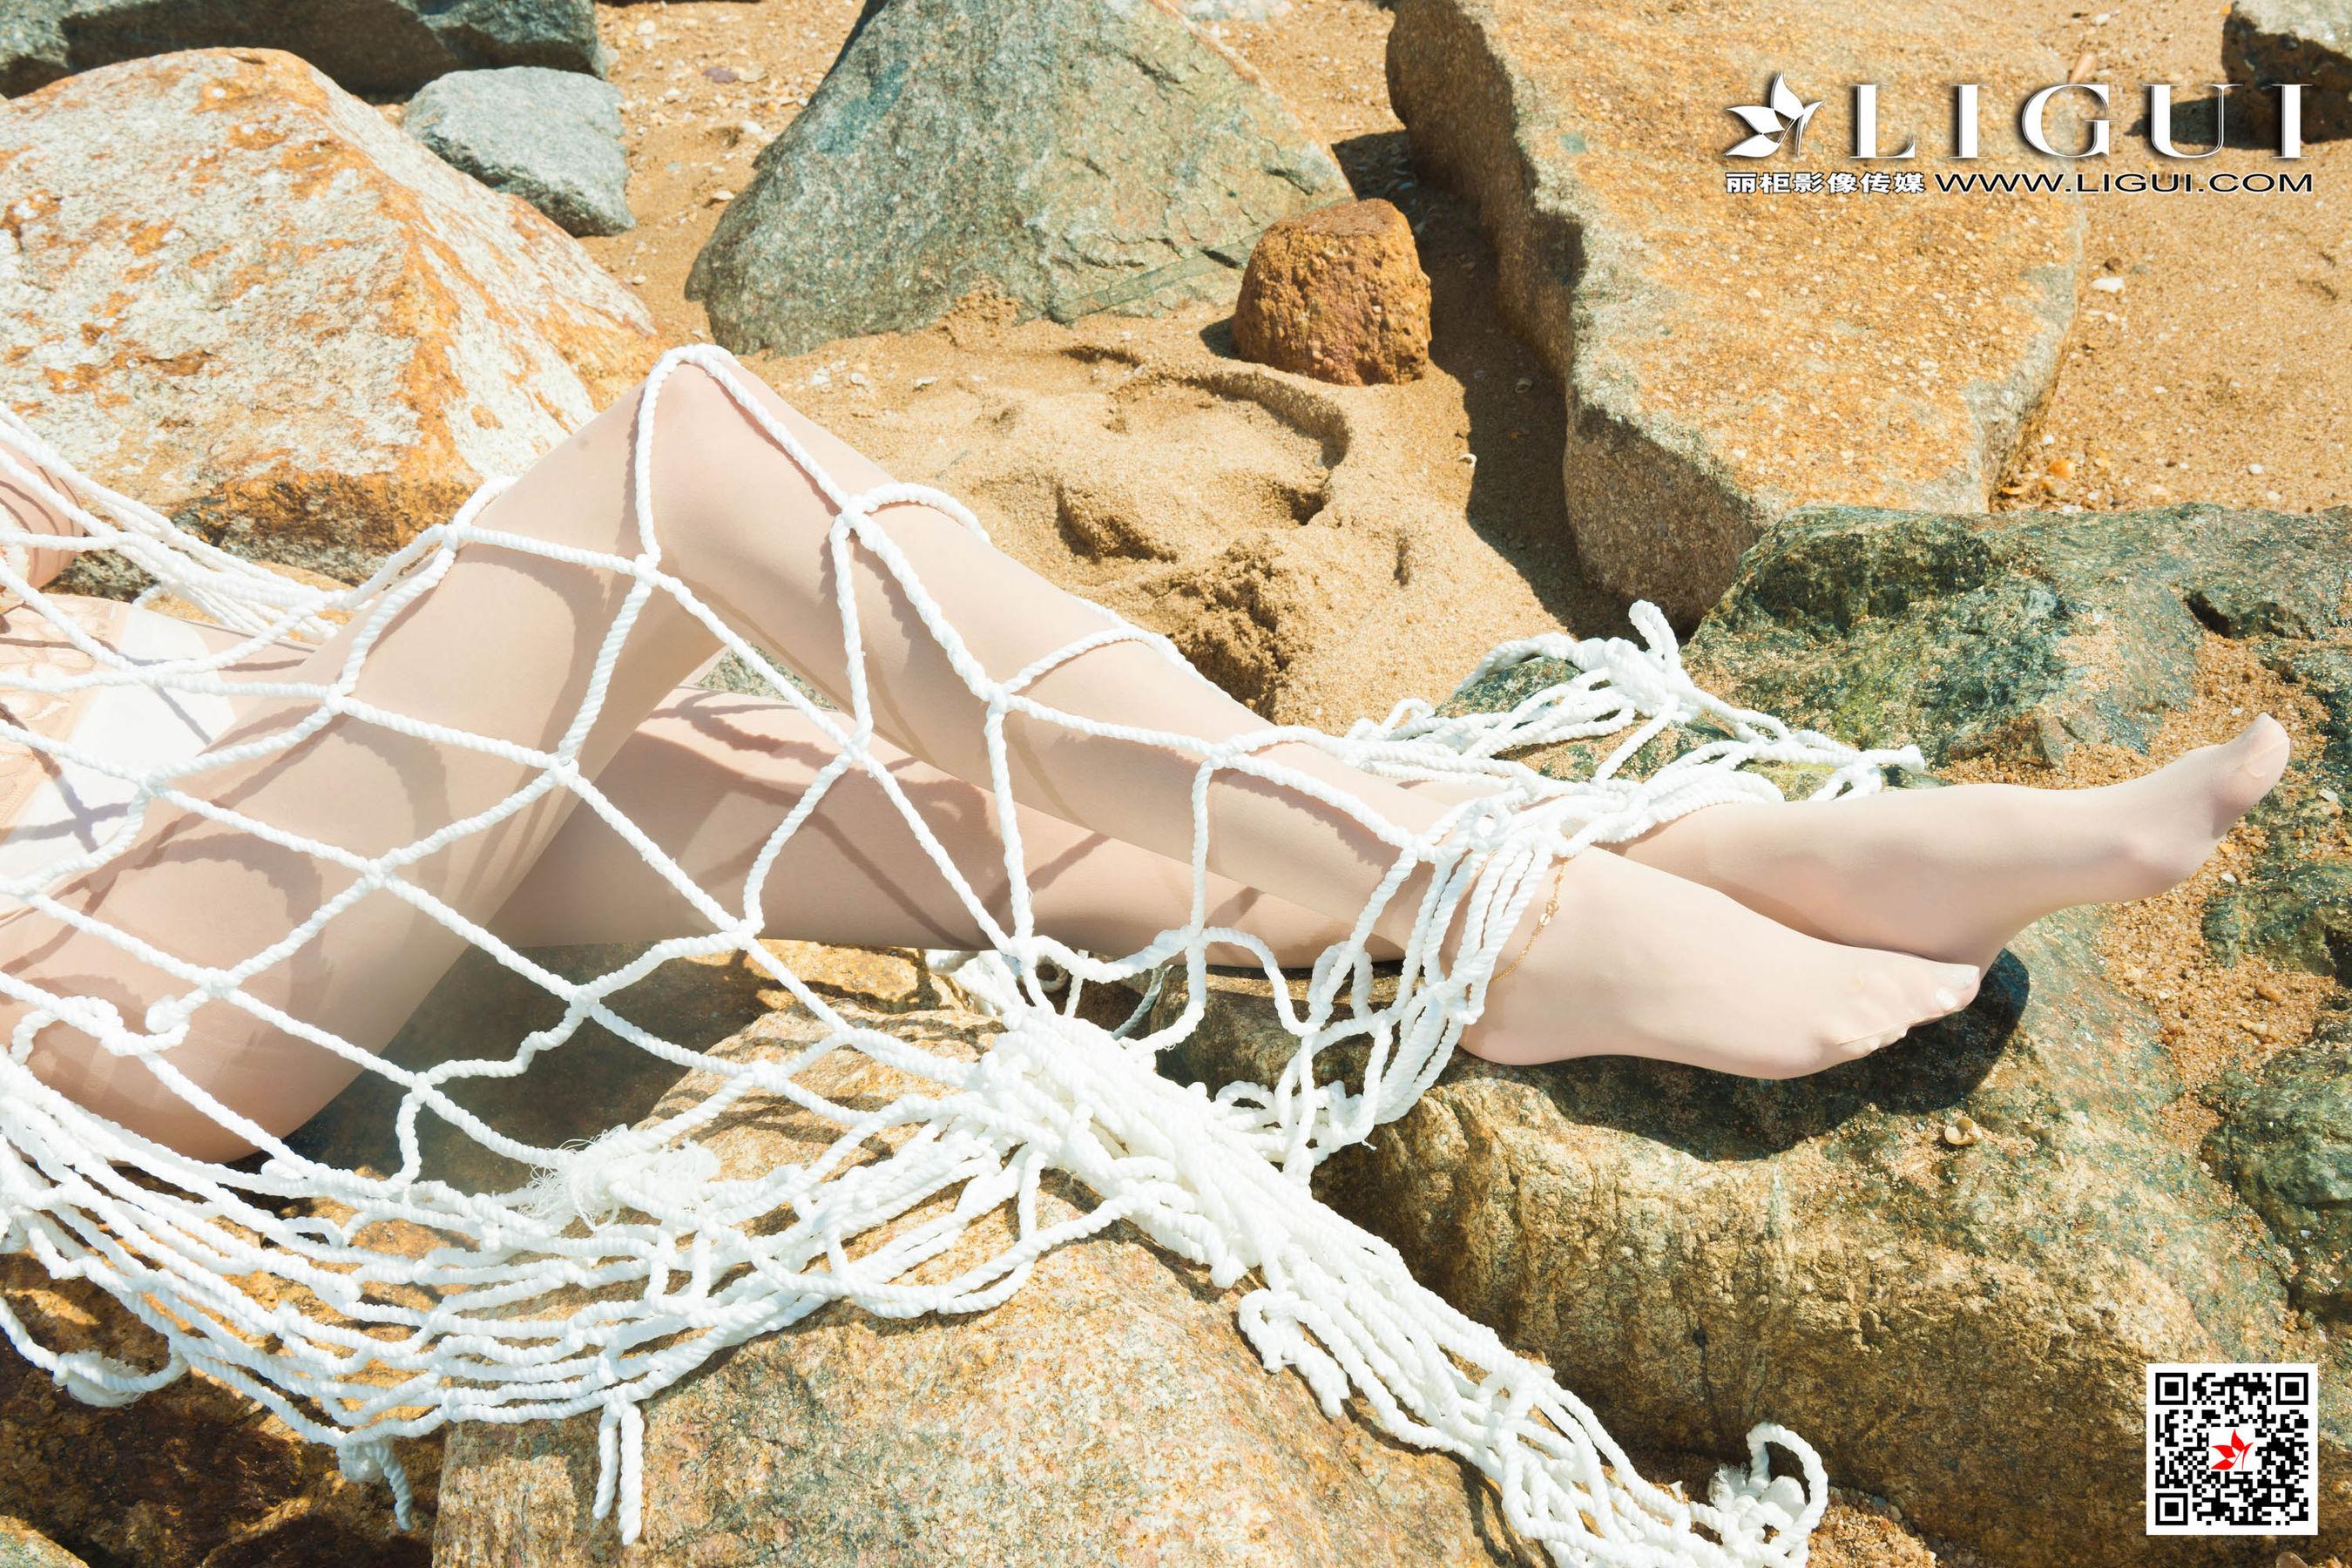 VOL.1472 [丽柜]泳装人体艺术海边美女:丽柜兔子(腿模兔子,足模兔子,LIGUI兔子)超高清写真套图(68P)